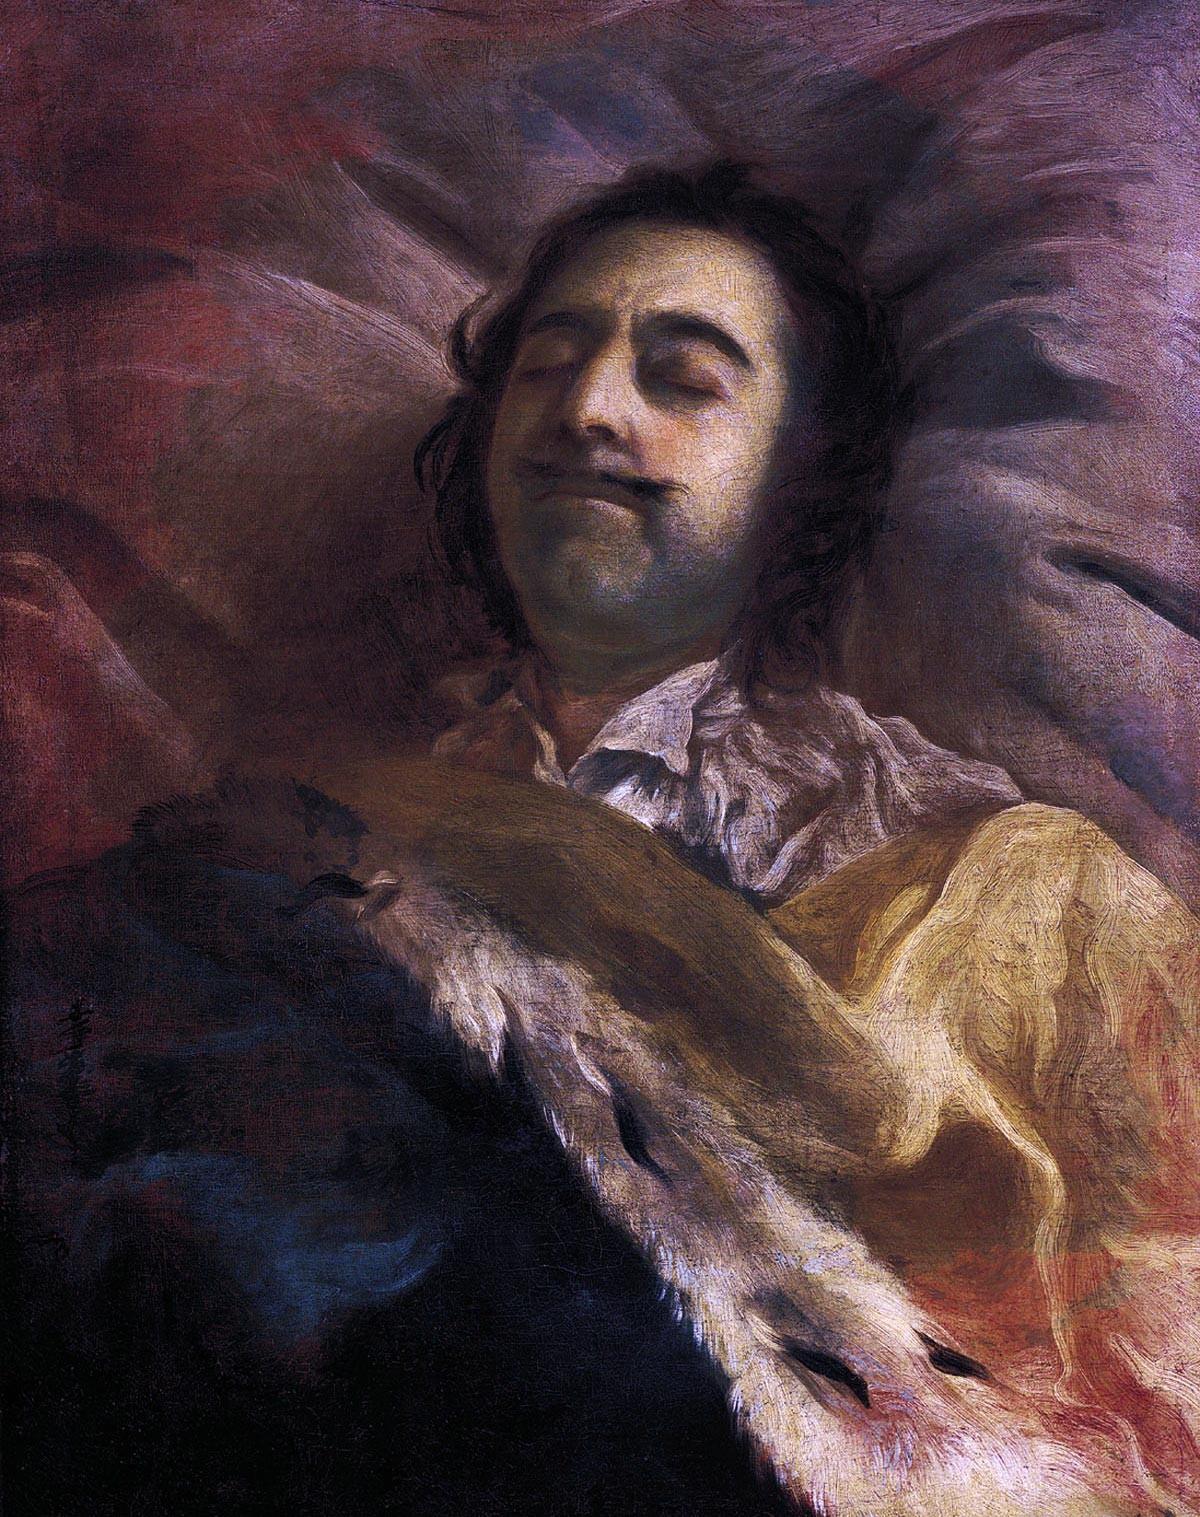 Peter I. auf dem Sterbebett